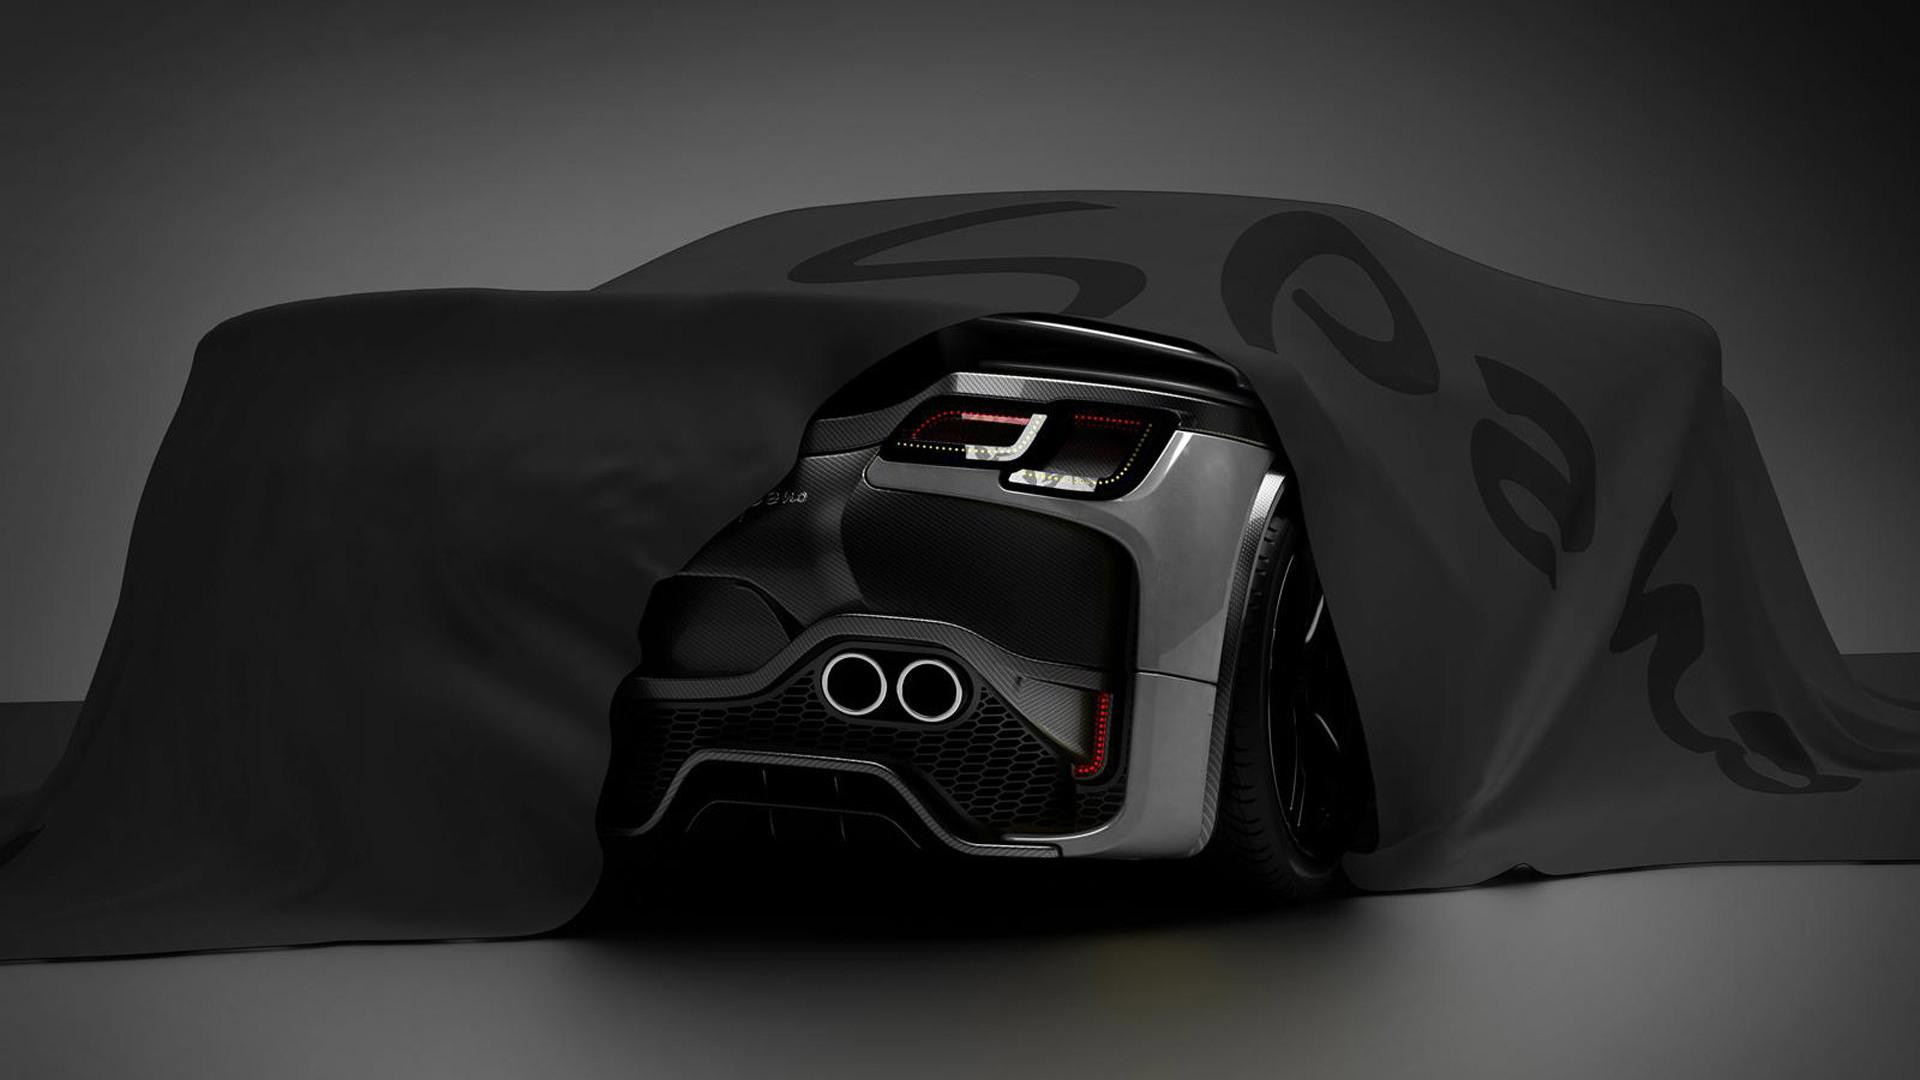 Teaser for 2015 GTA Spano debuting at 2015 Geneva Motor Show